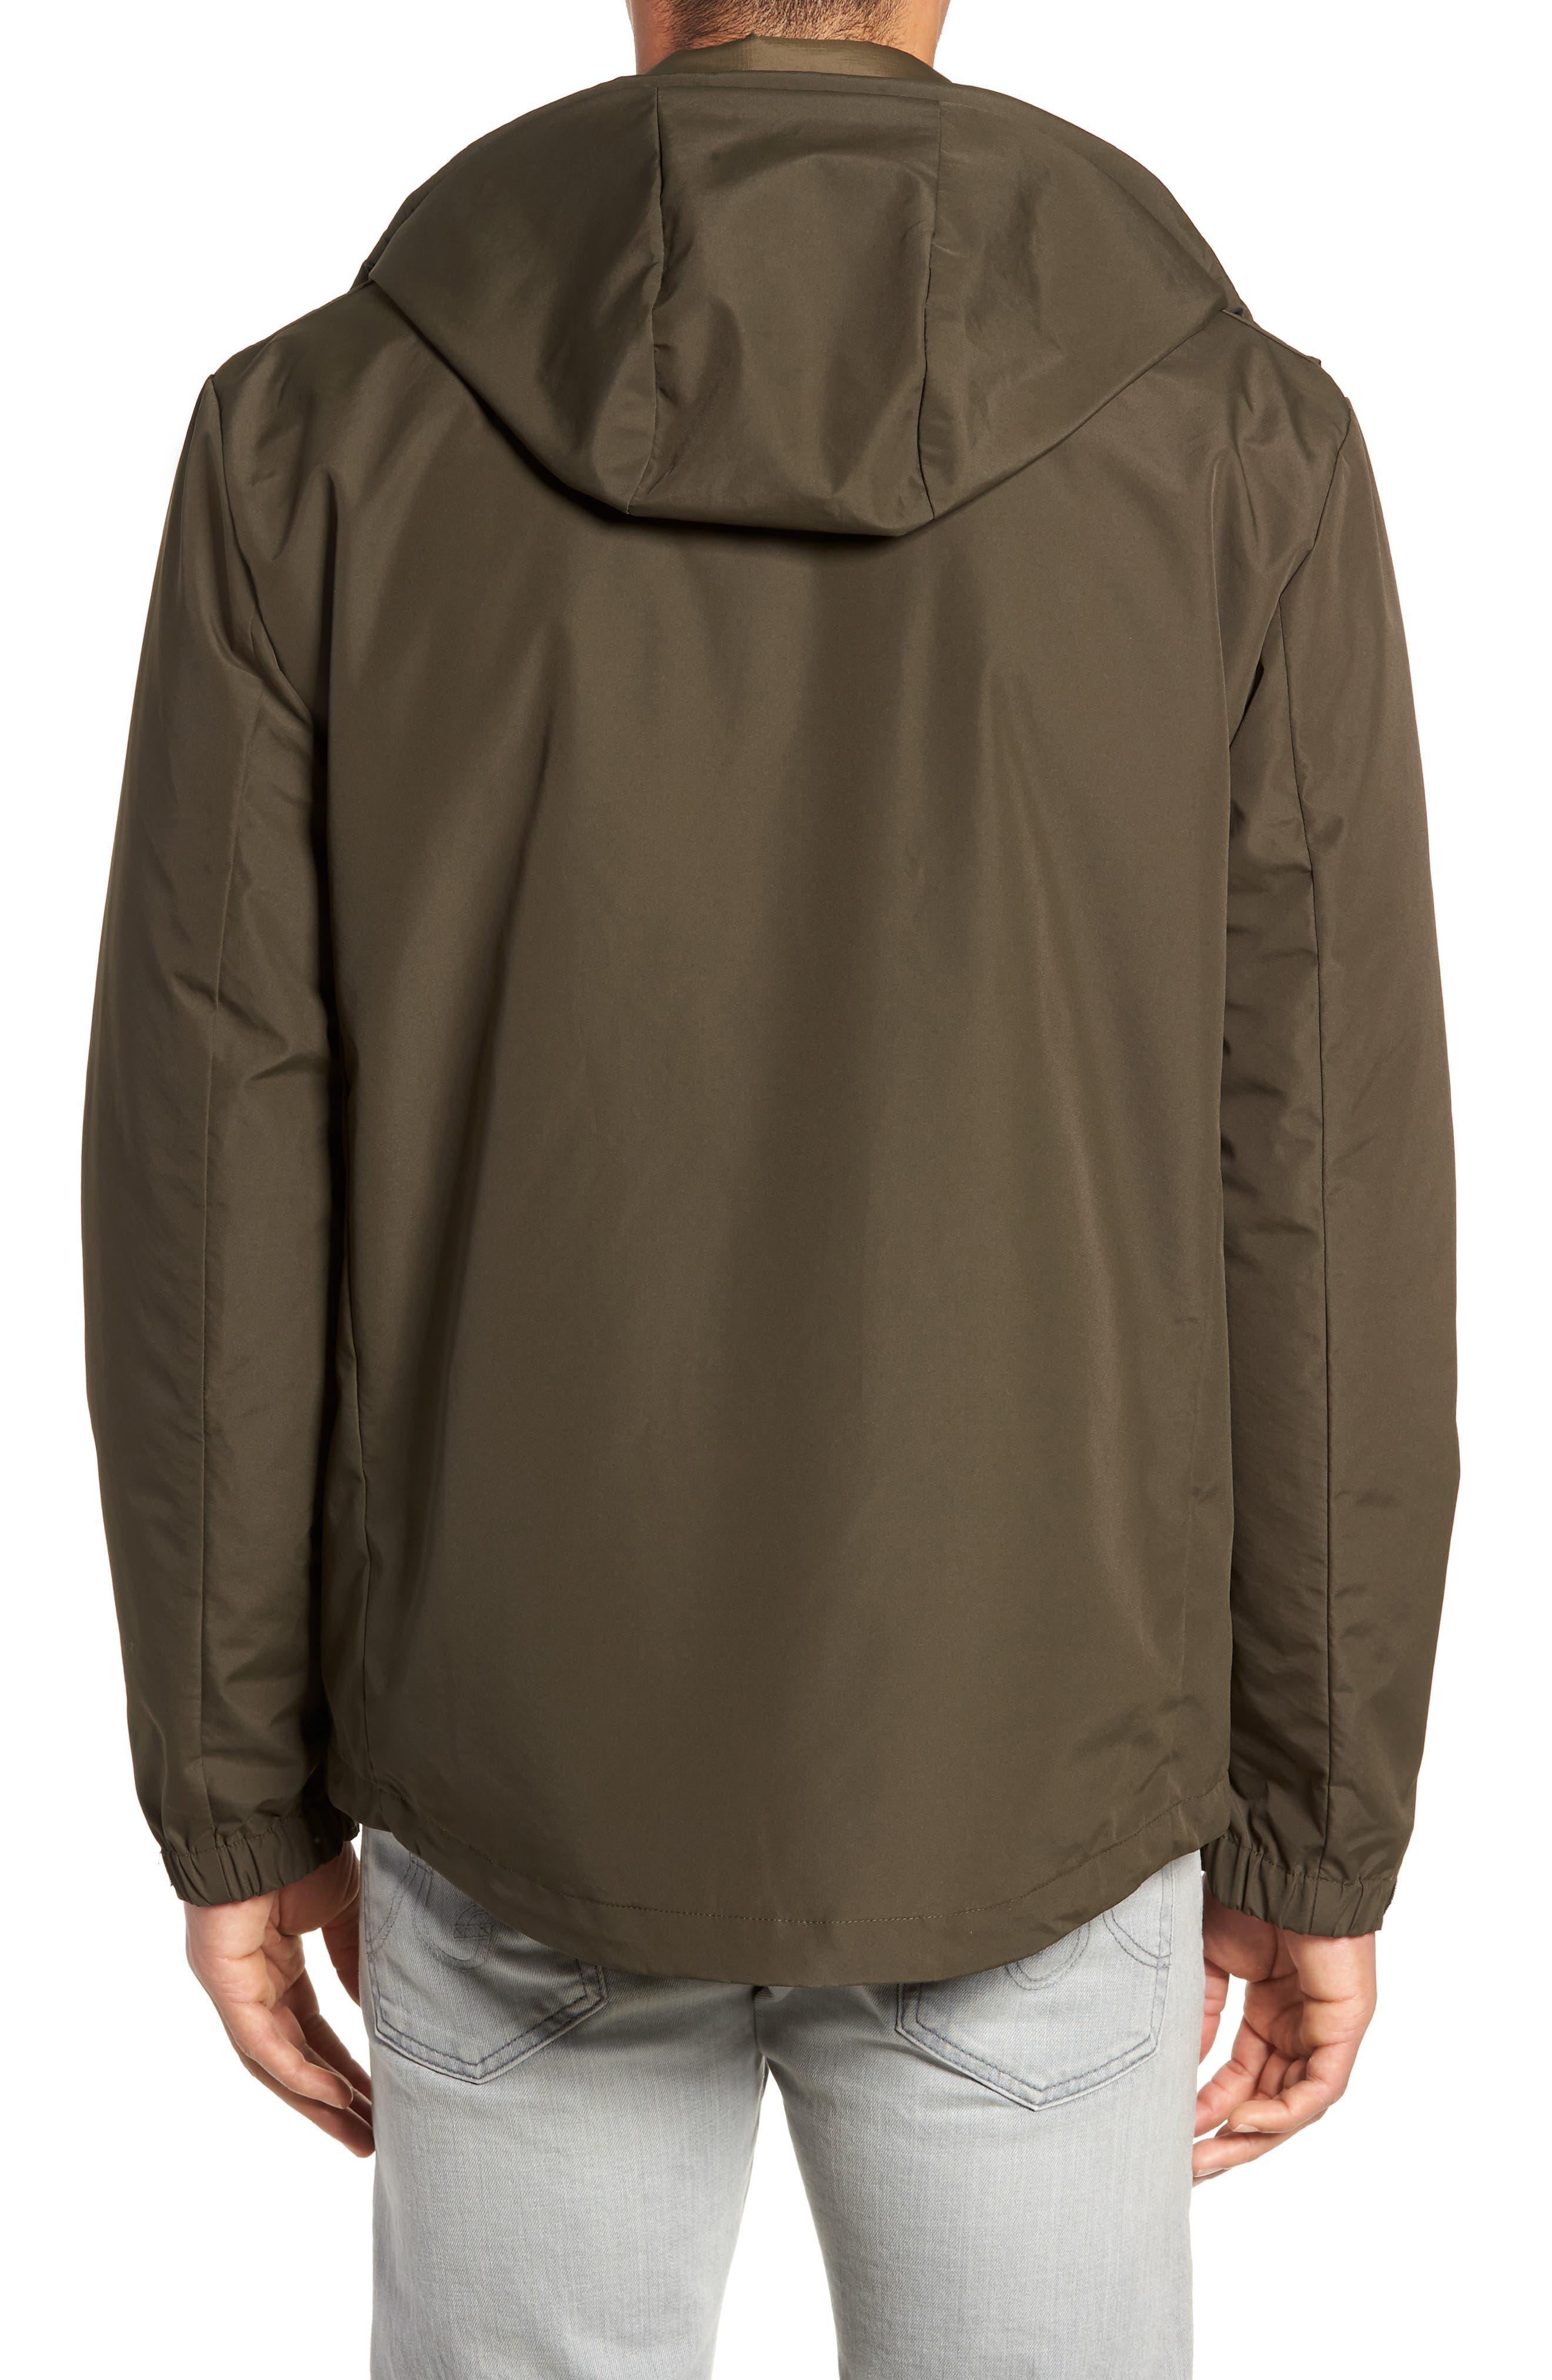 3-in-1 Rain Jacket,                             Alternate thumbnail 3, color,                             OLIVE